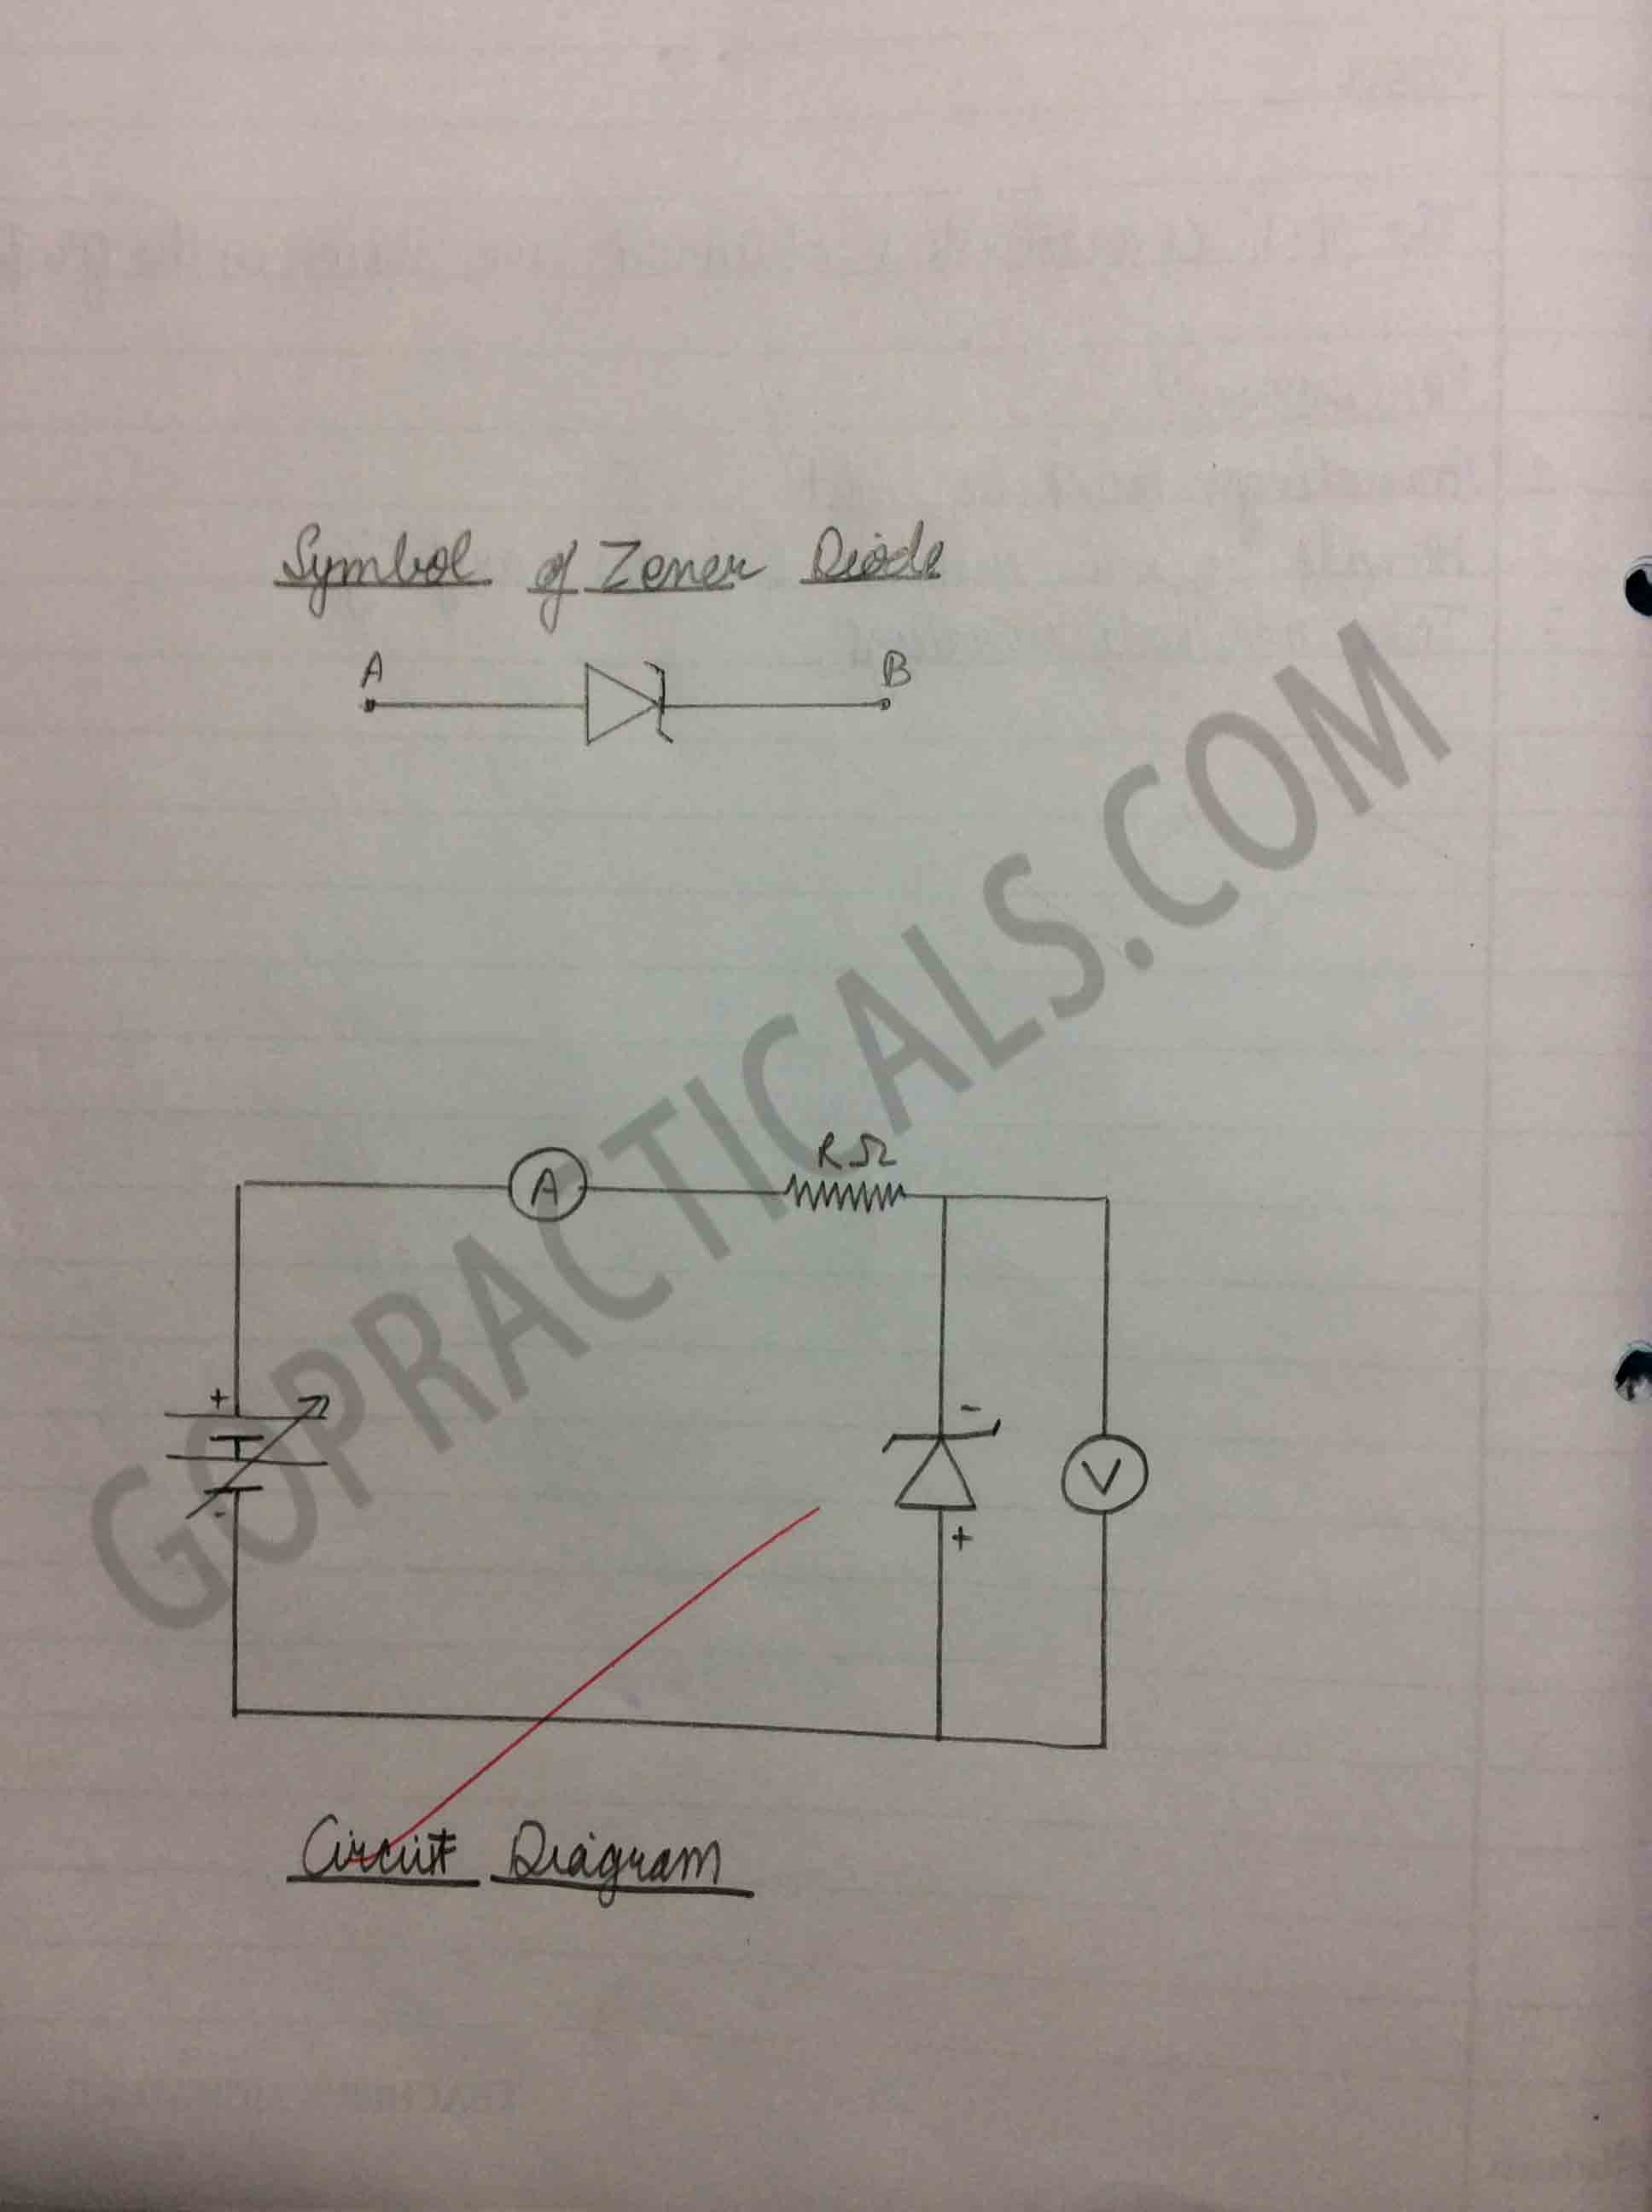 V-I characteristics of Zener Diode-2